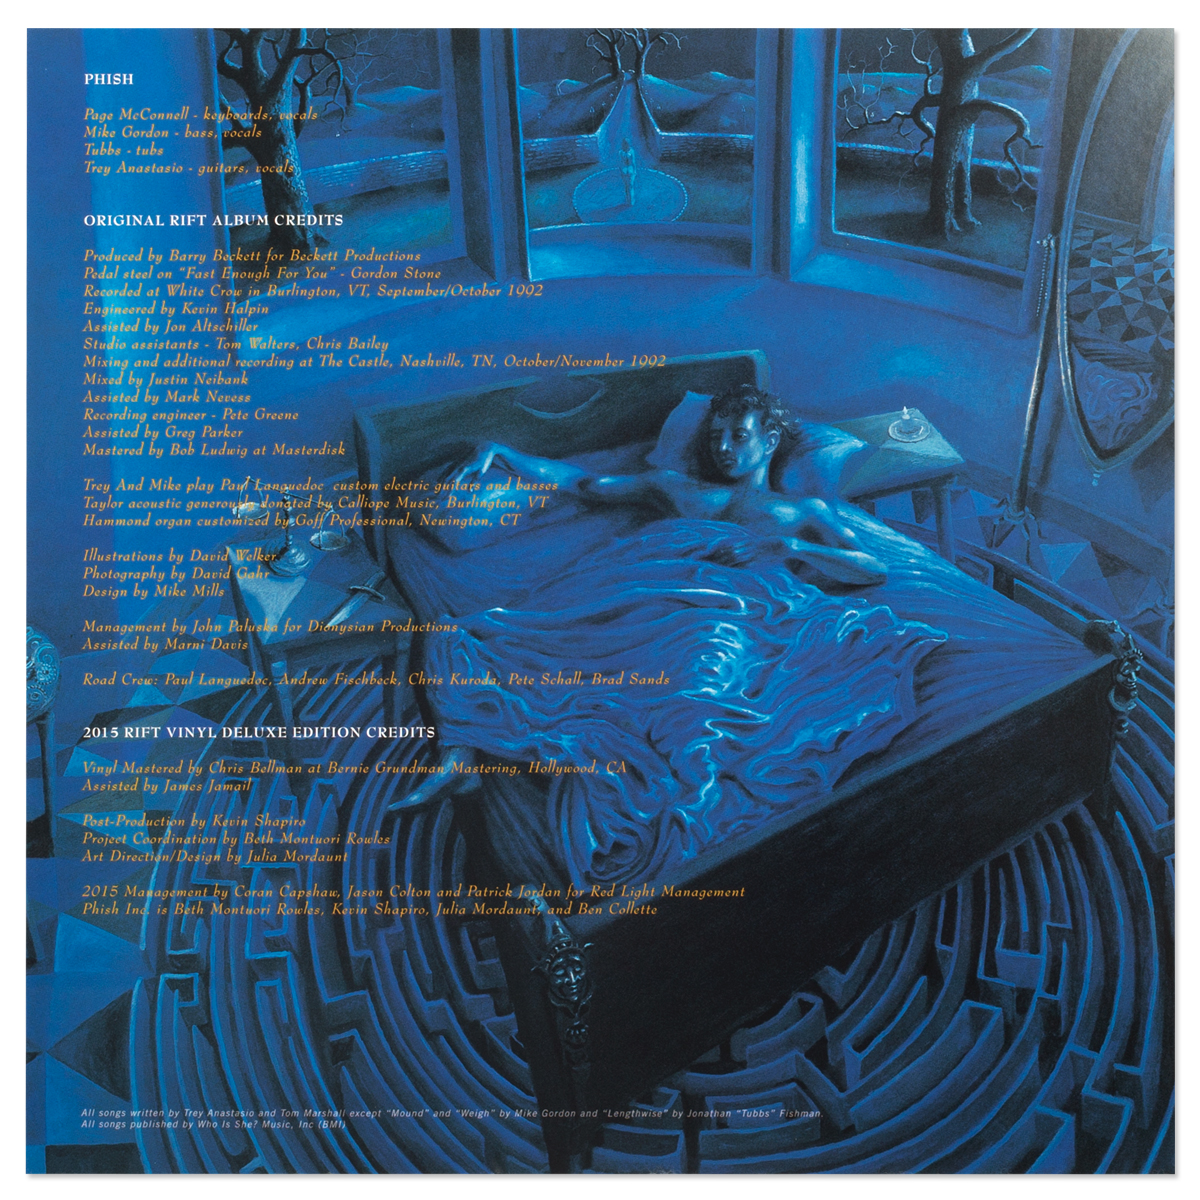 Rift 2-LP Deluxe Edition Vinyl